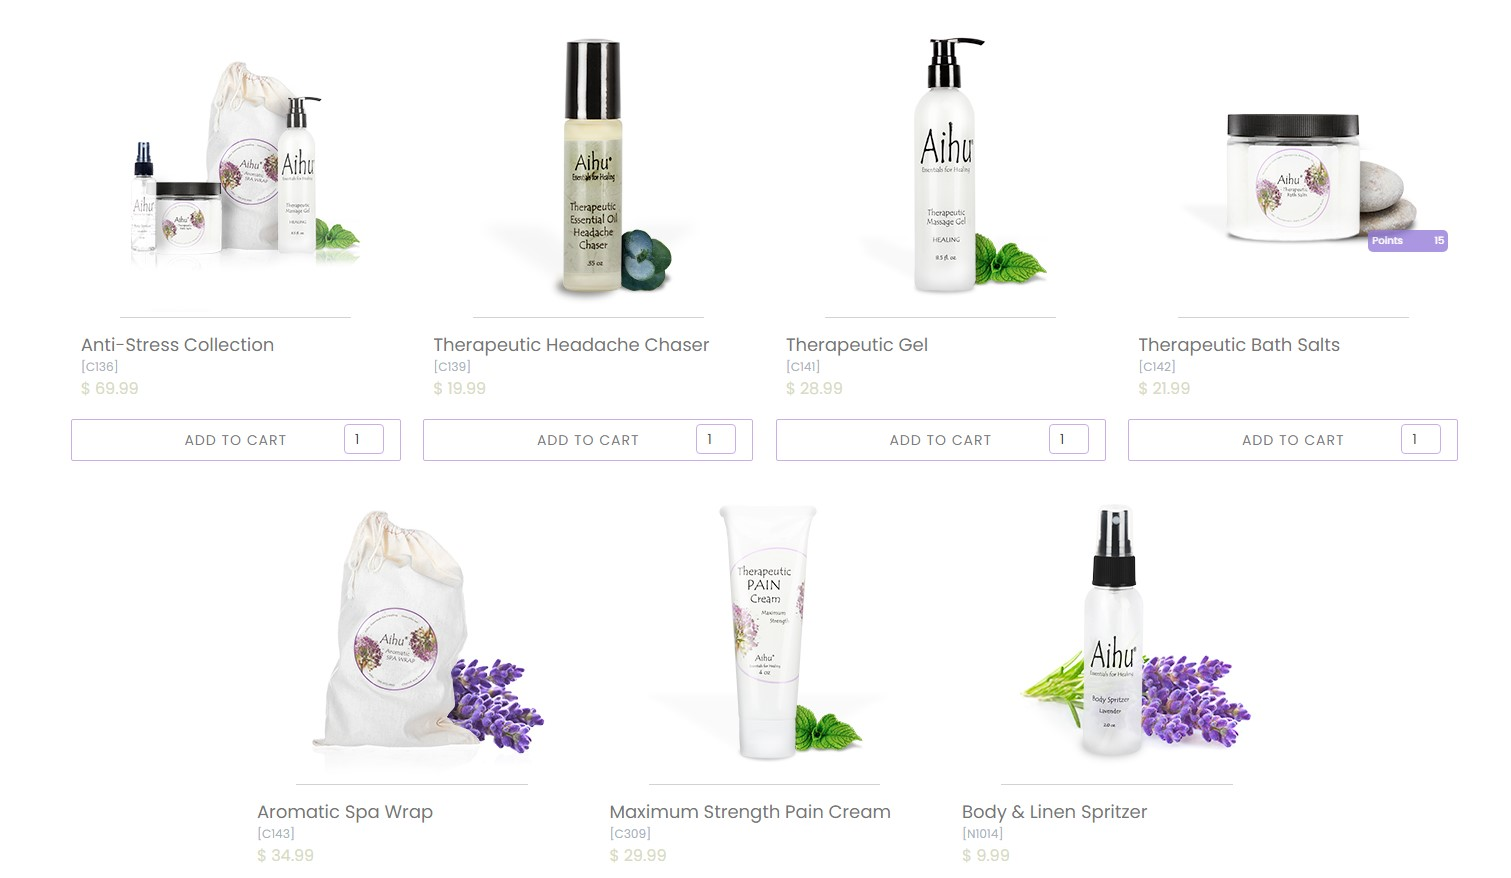 aihu products